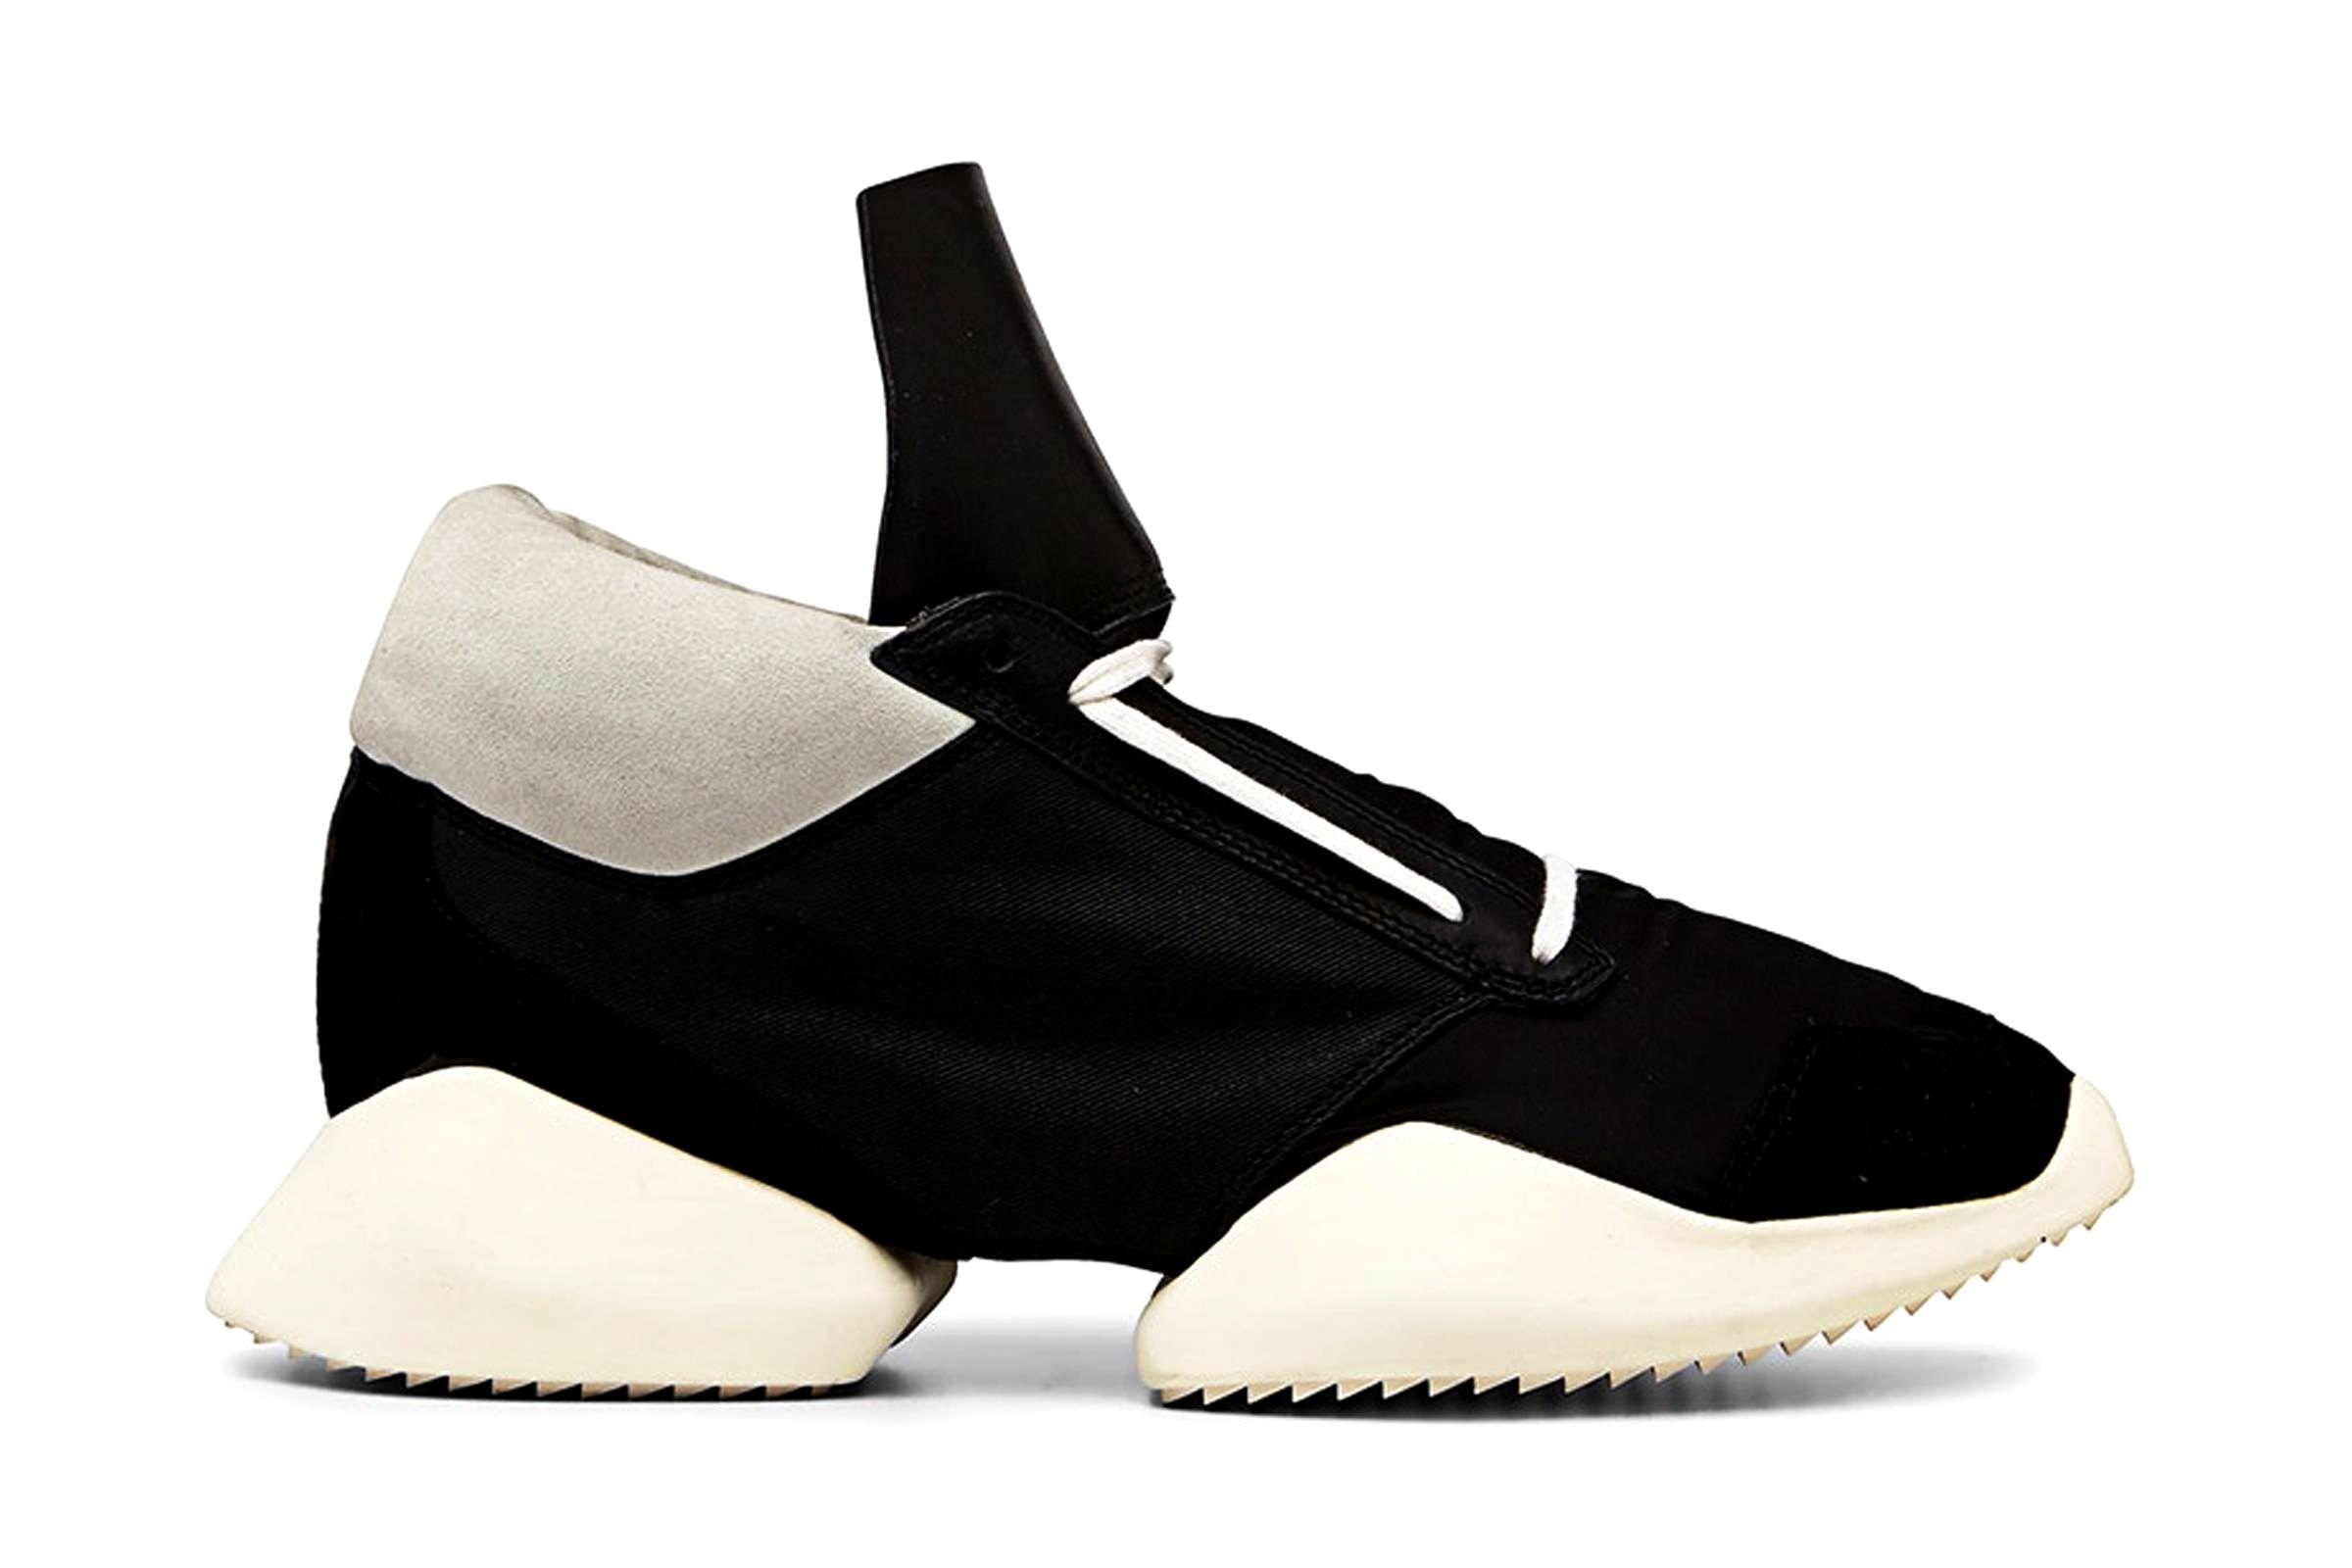 adidas by Rick Owens Runner Spring/Summer 2014